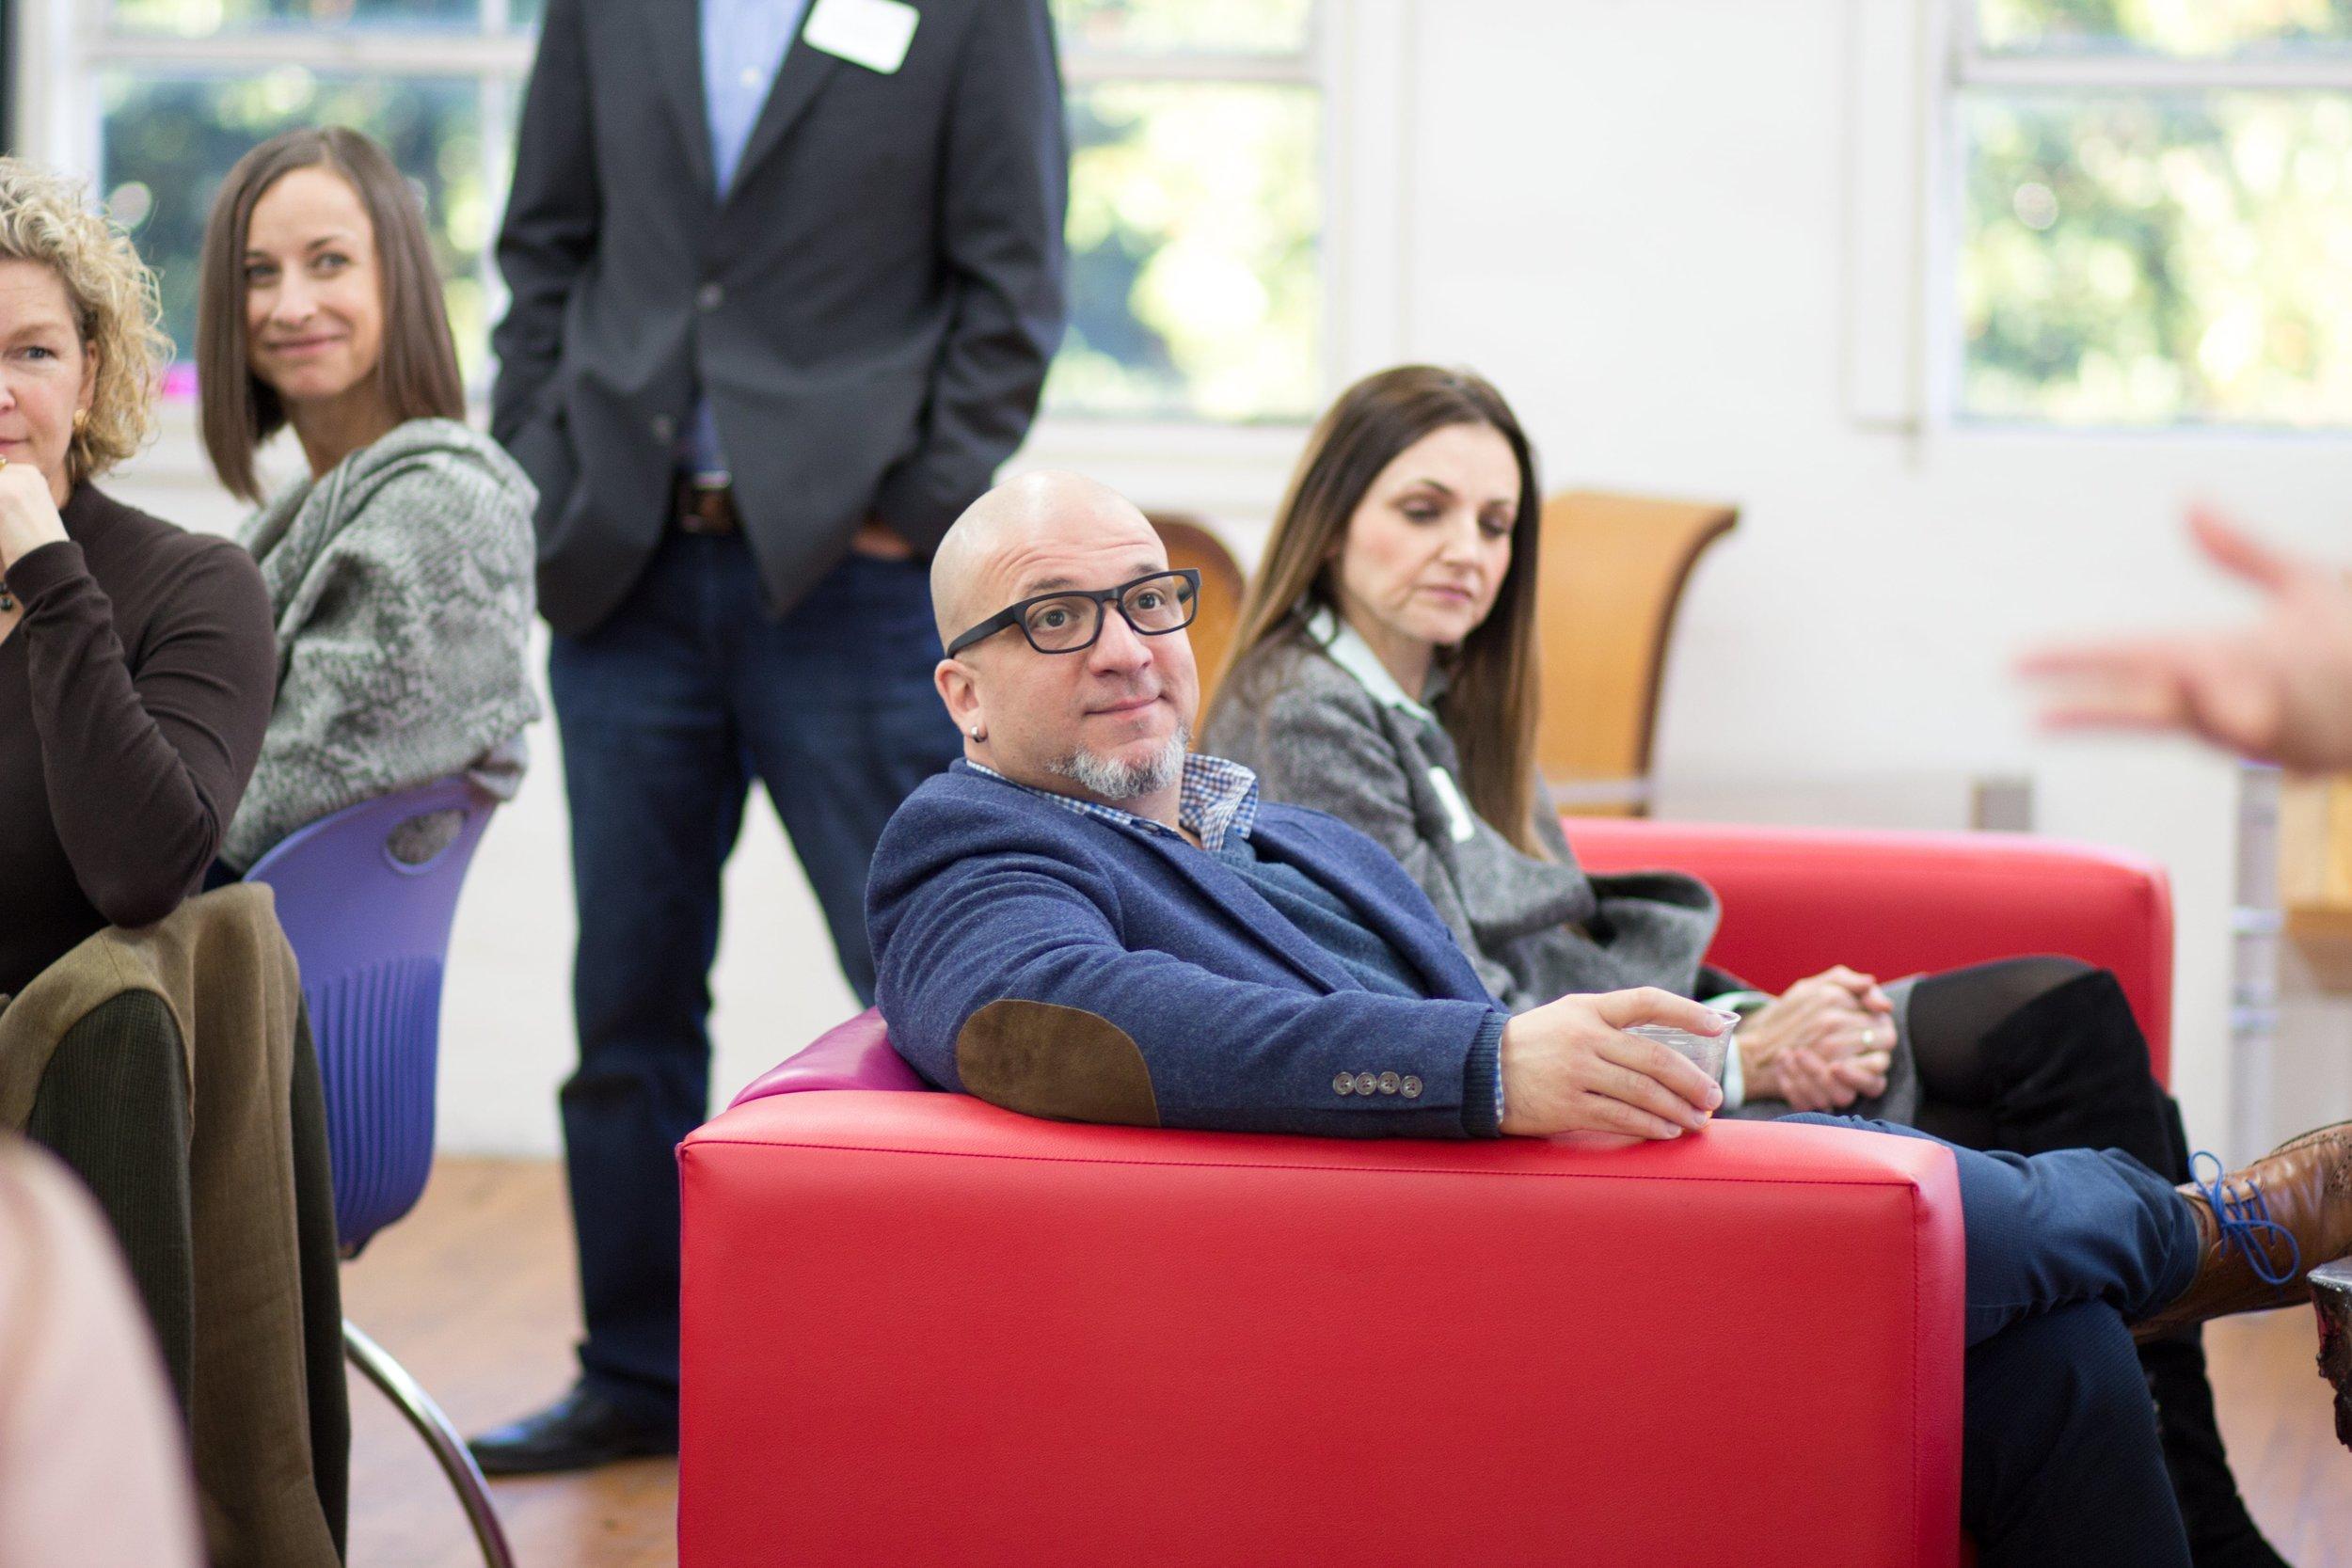 Javier Santana | Co-Founder, Launch